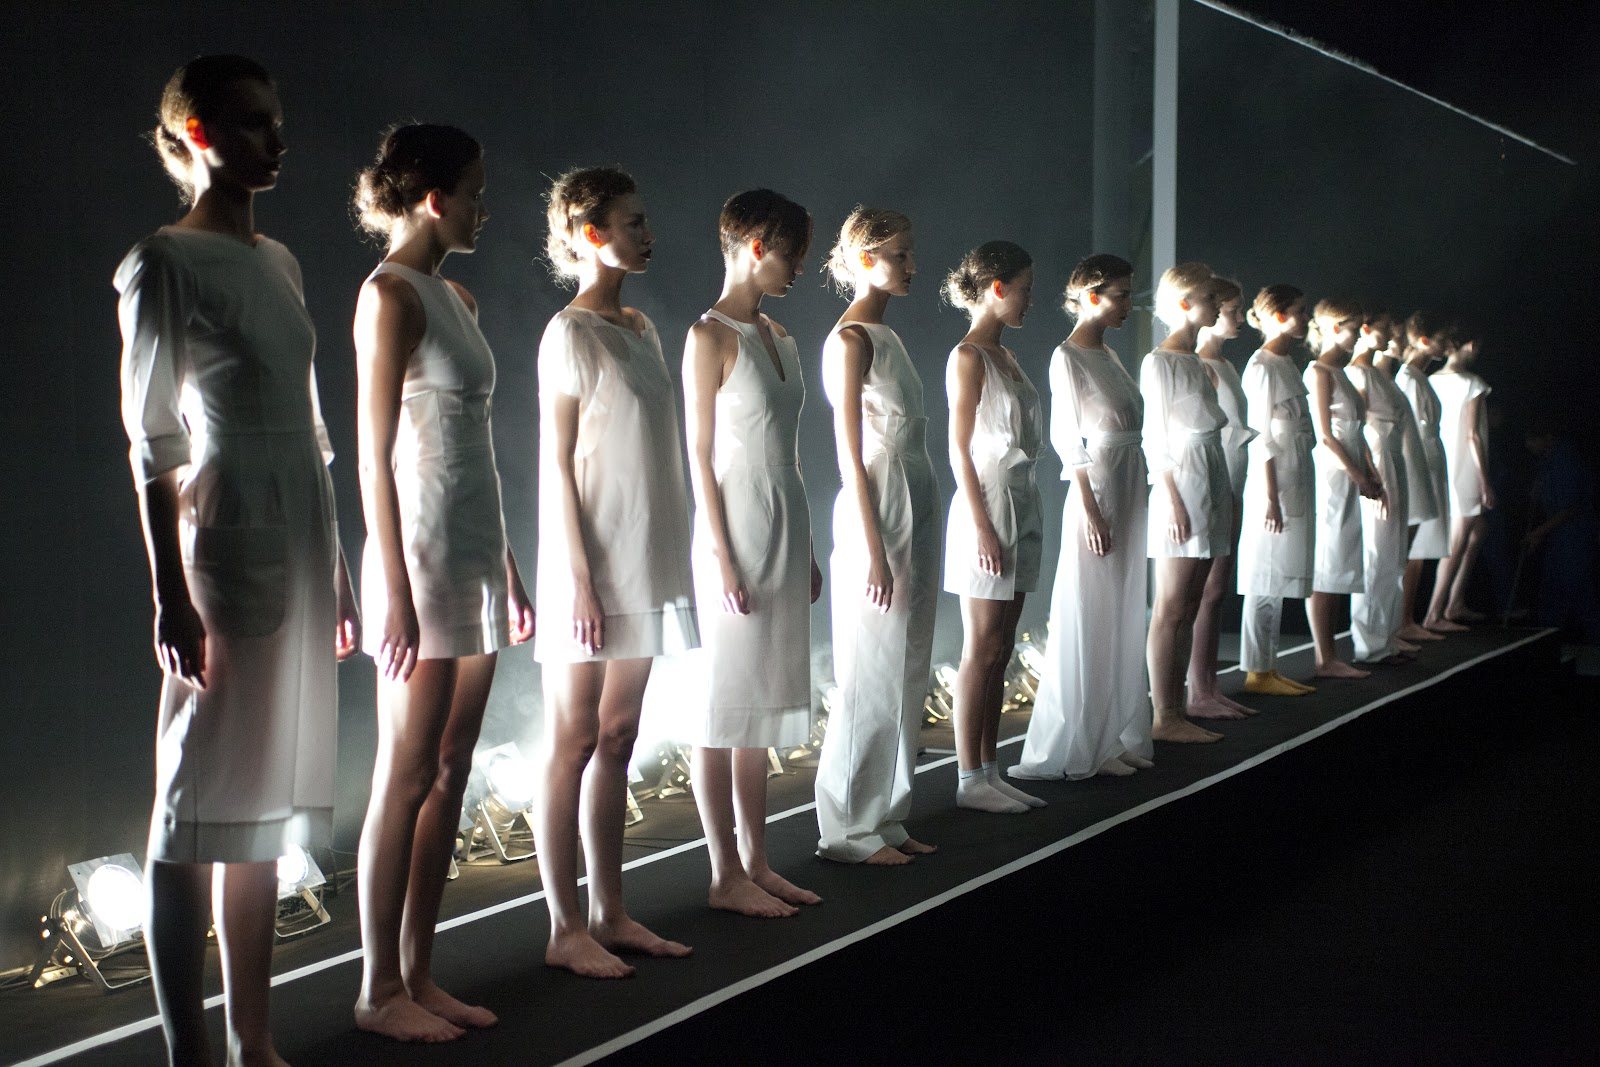 мерседес бенц fashion week russia фото